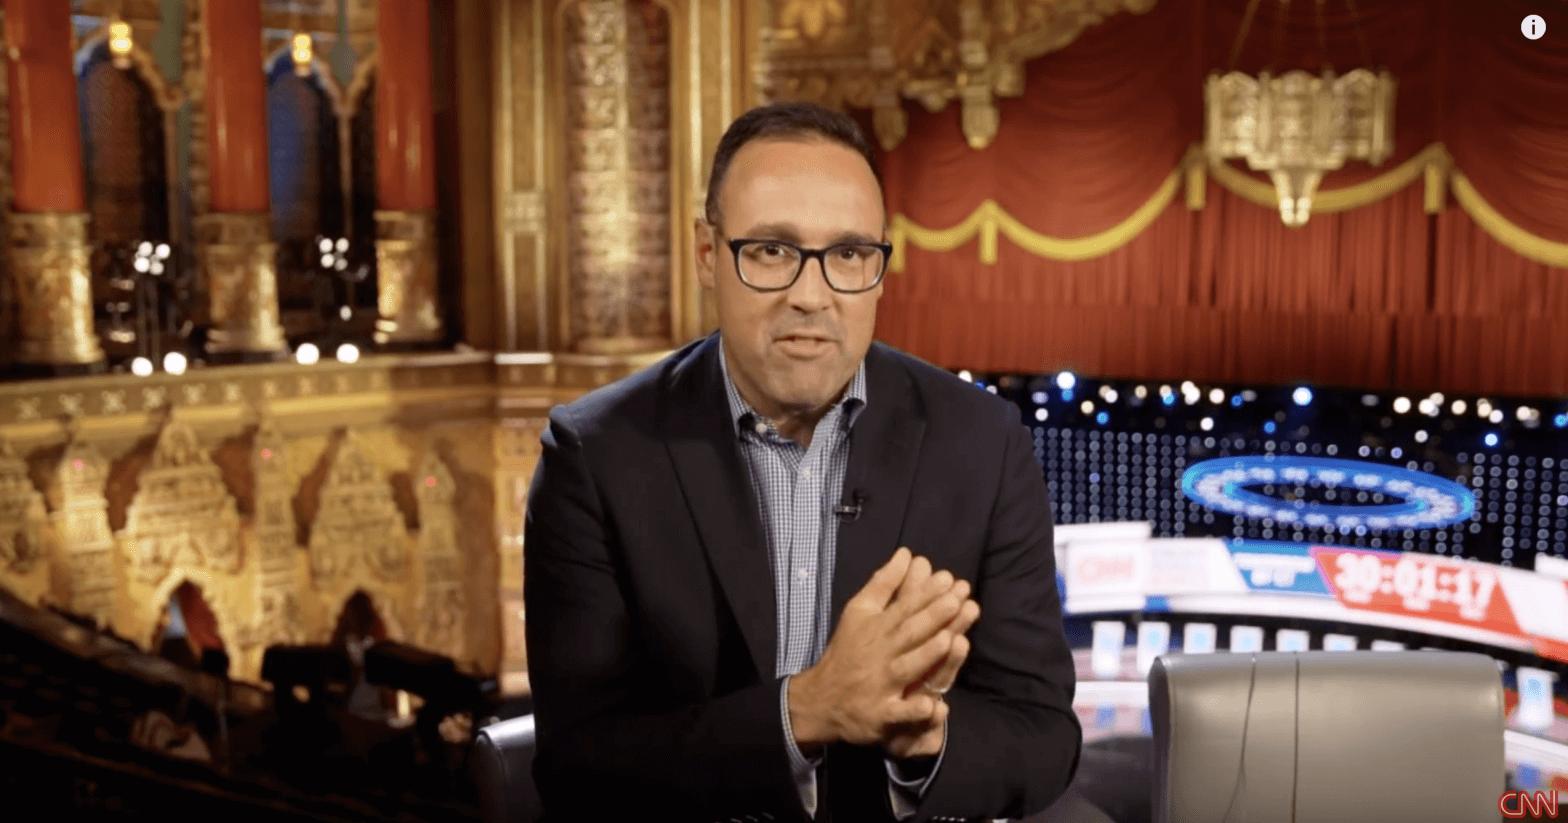 The 3 keys to winning a 2020 debate